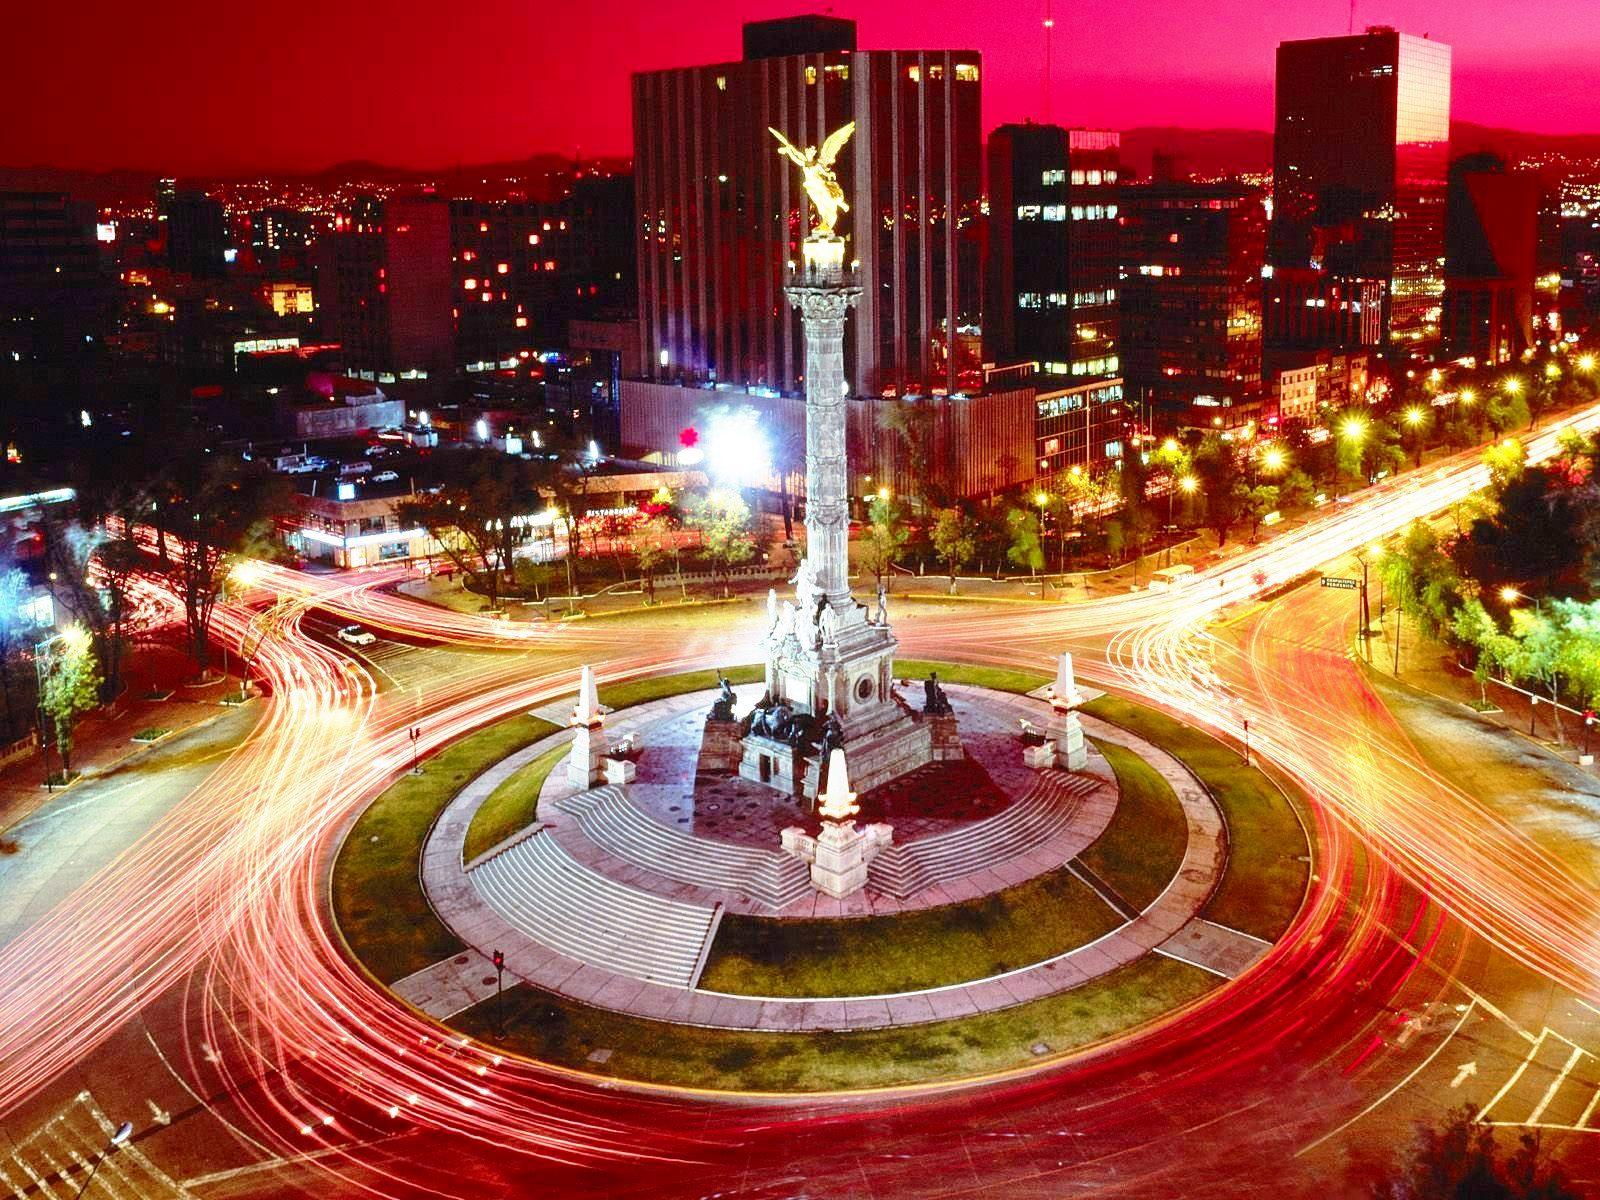 http://4.bp.blogspot.com/-YJeWBF7aMKM/UUEFVEWNvuI/AAAAAAAAApc/-7vdNEYIoc0/s1600/wallpapers_ciudades_del_mundo_para_pc202.jpg